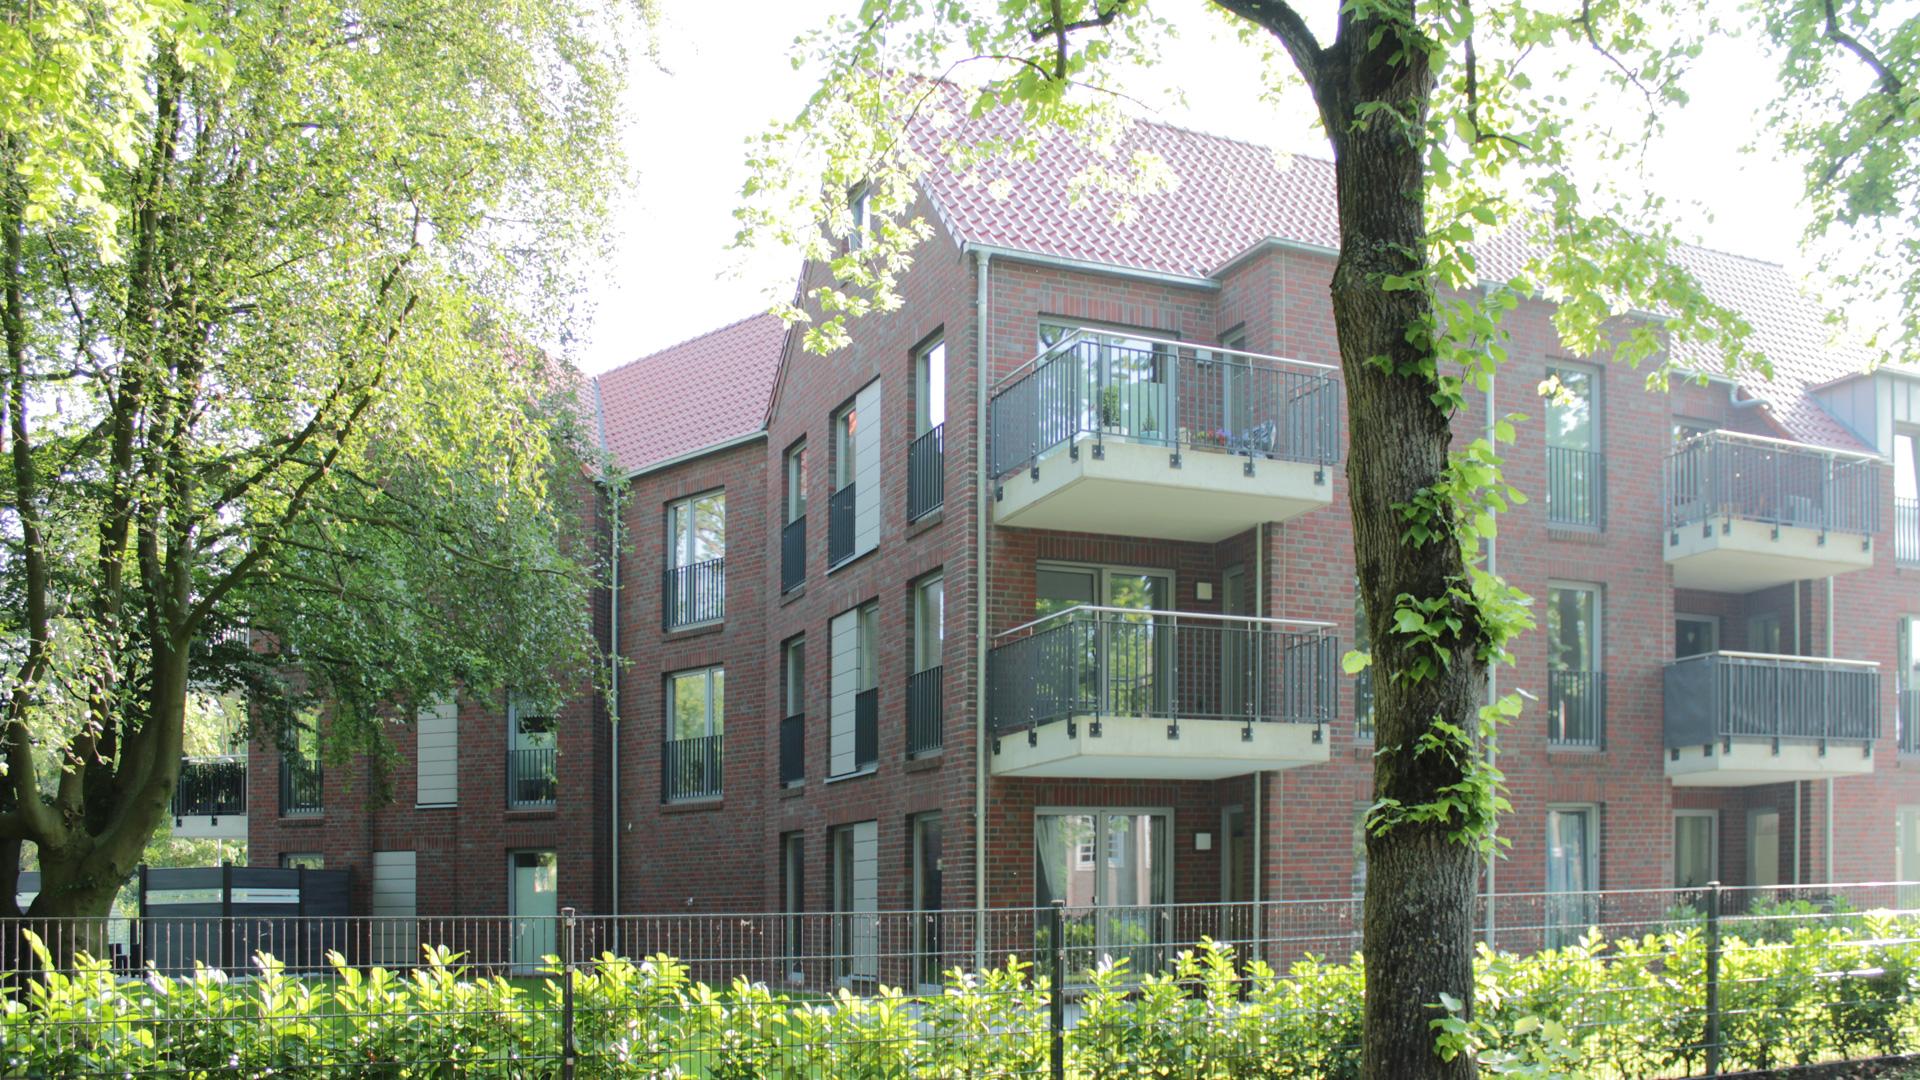 Neubau - Mehrfamilienhaus - Emden - 2017/2018